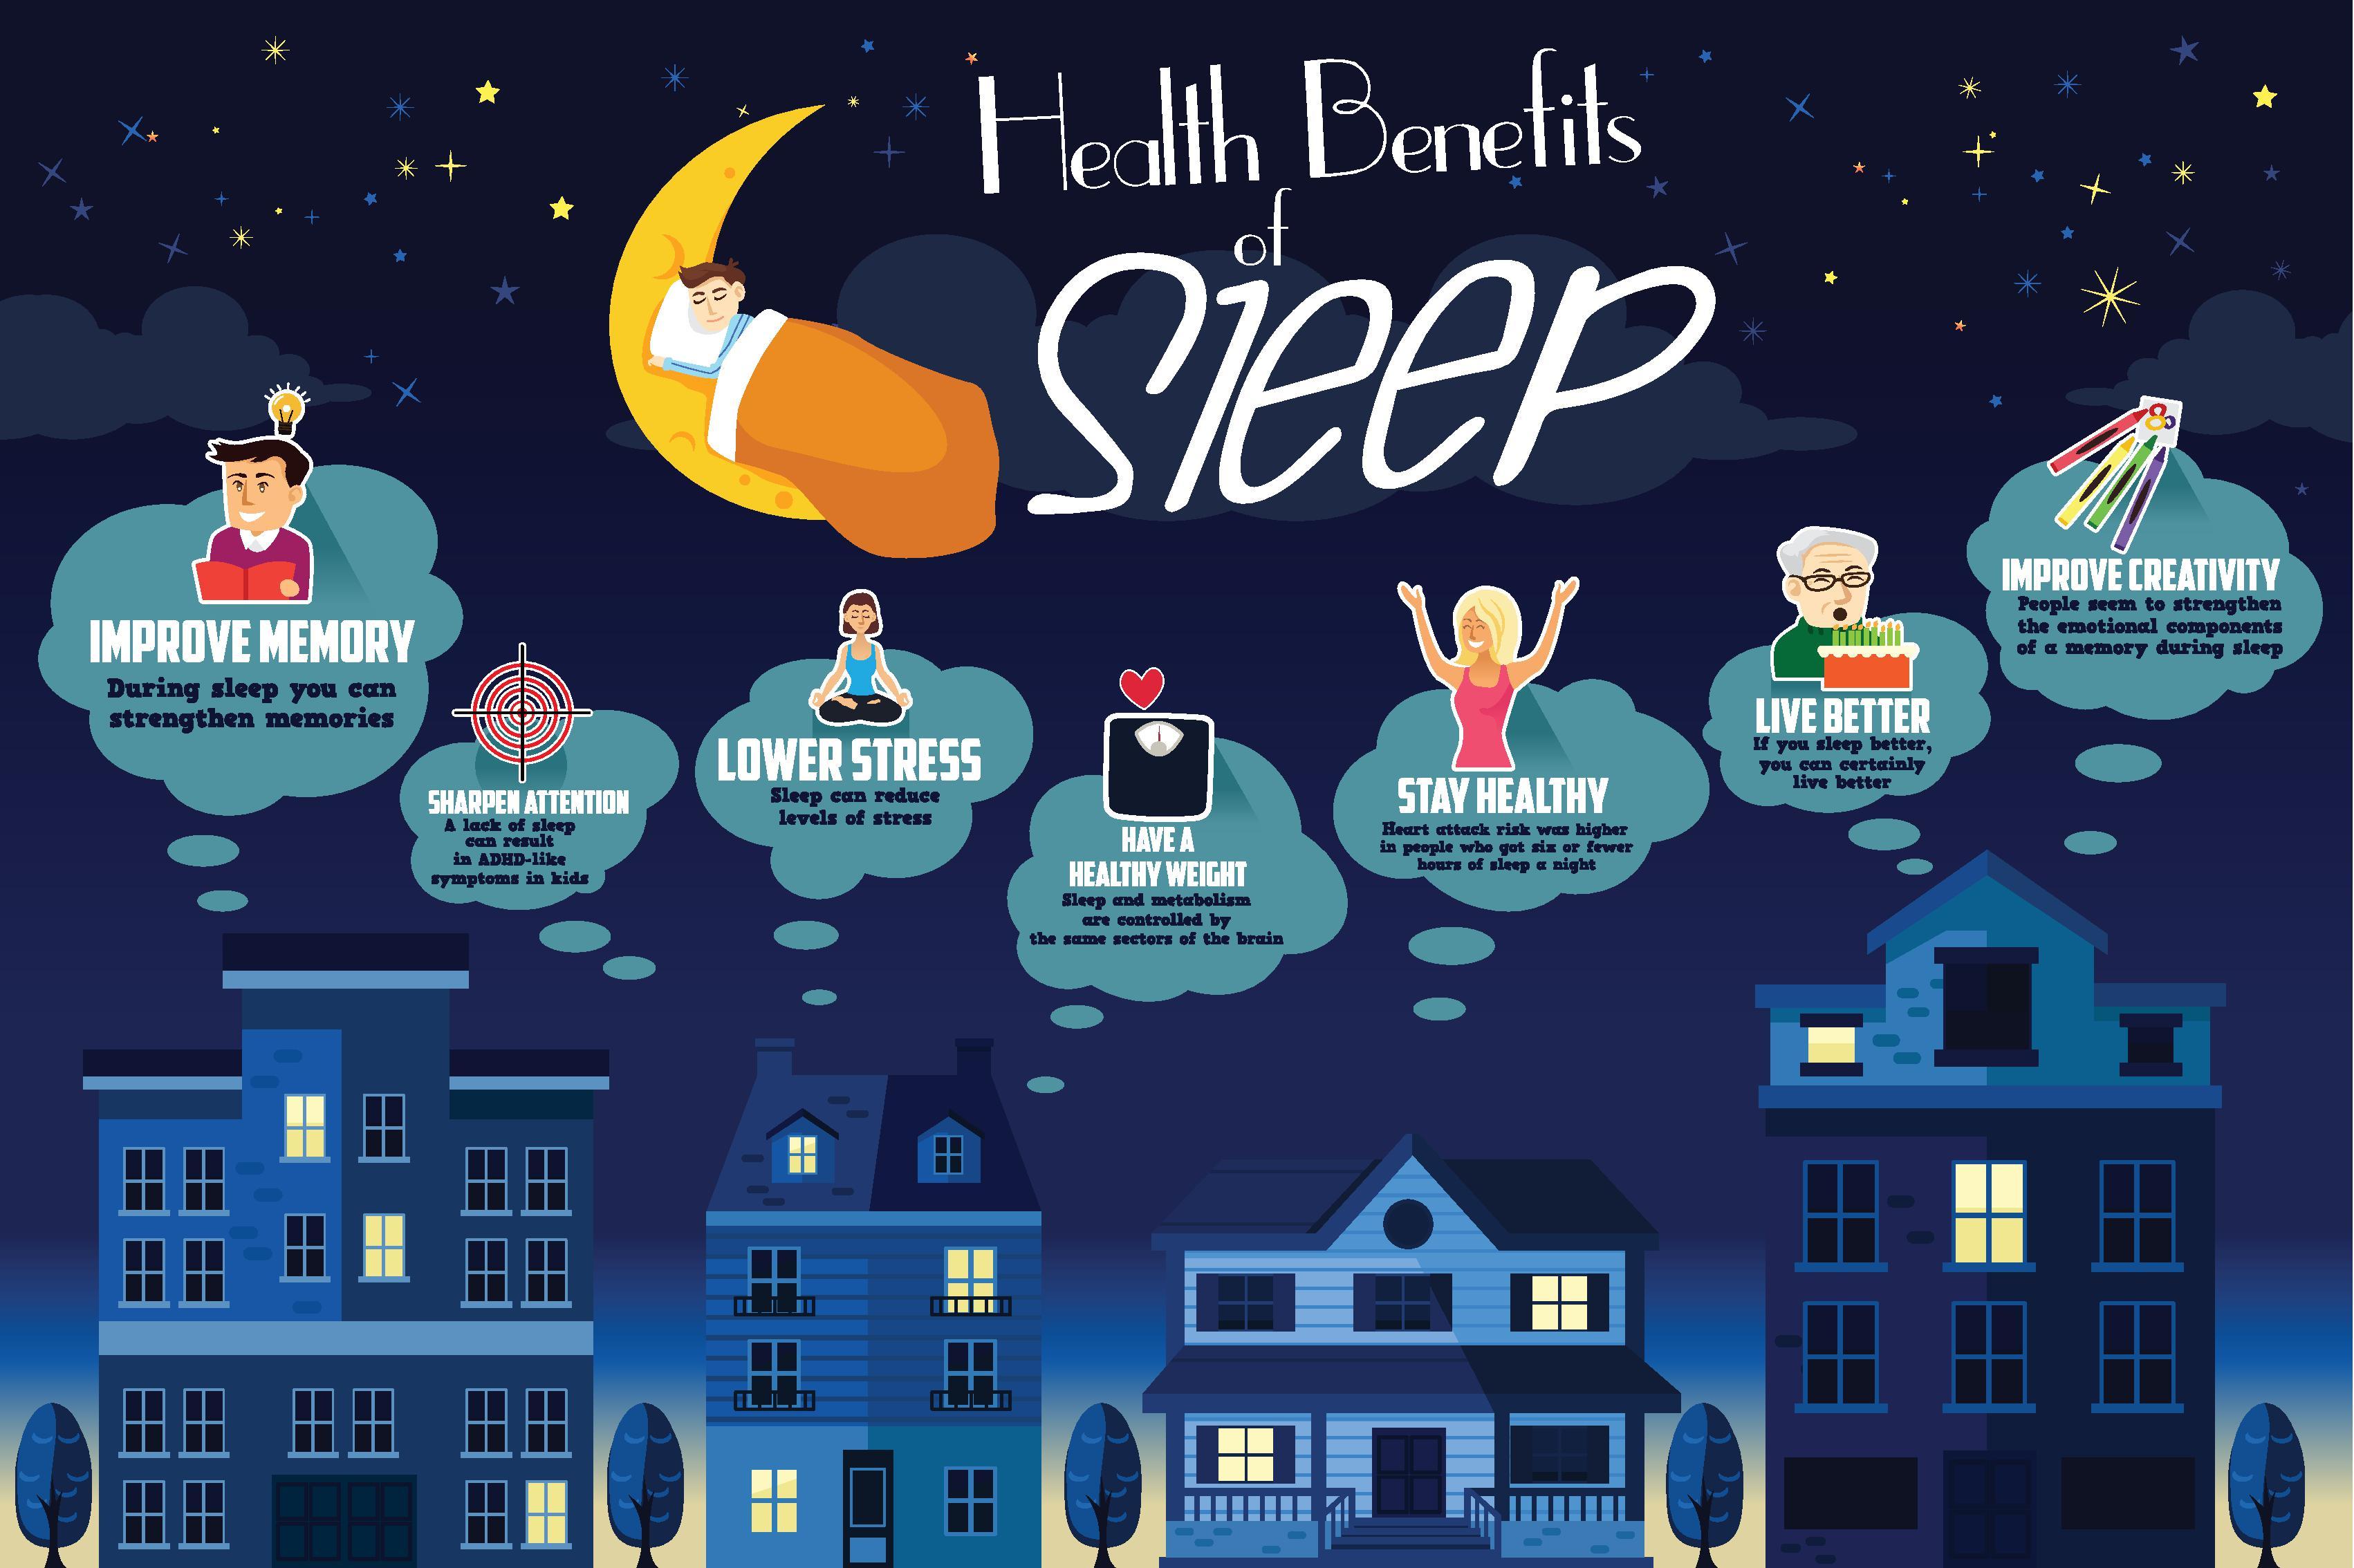 Infographic on the health benefits of sleep